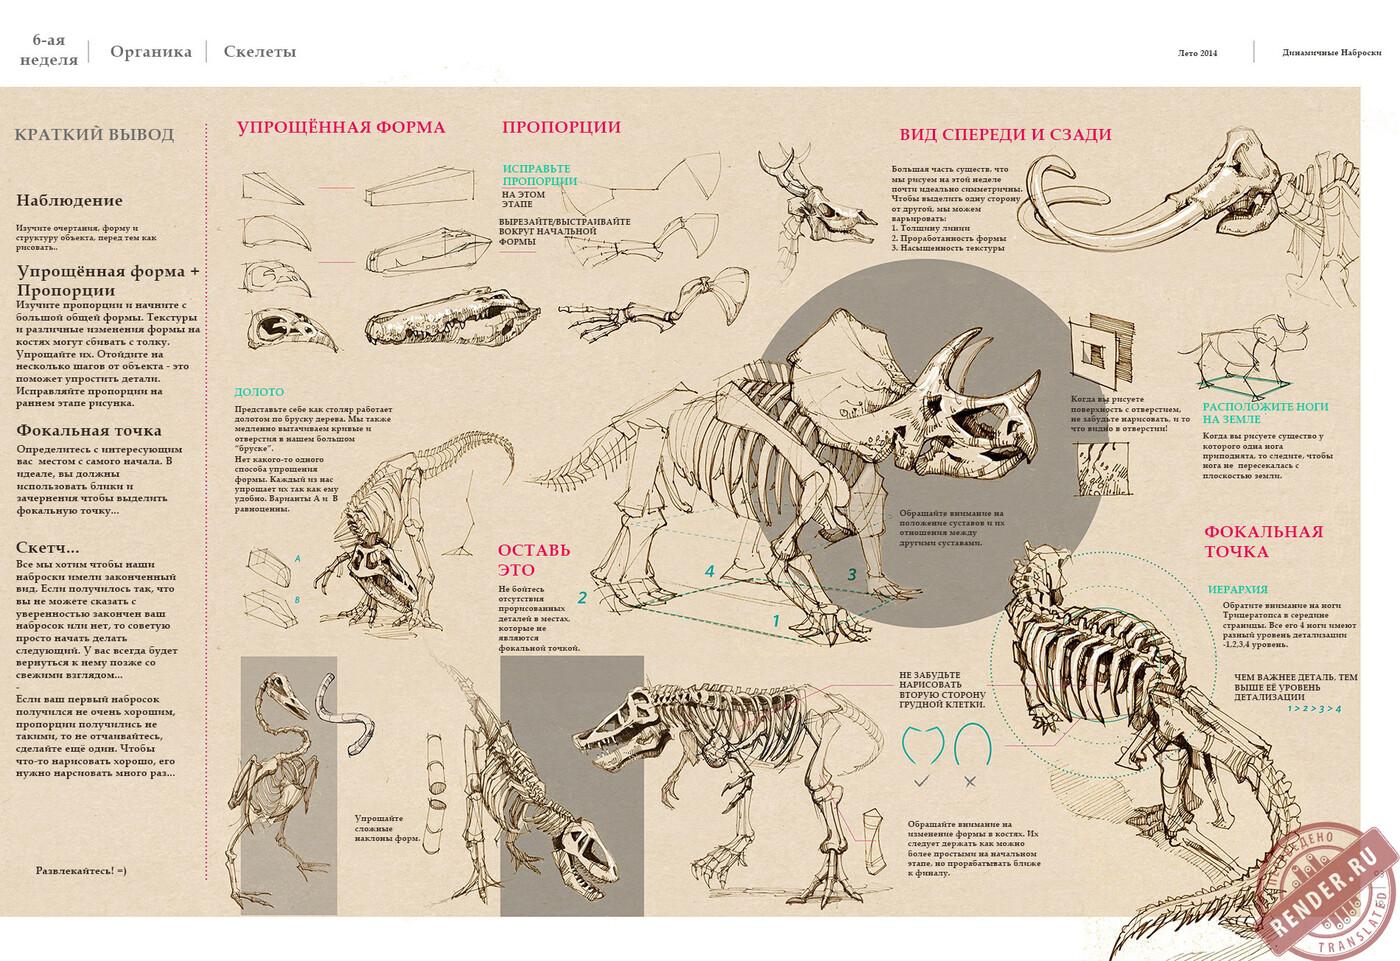 Скелеты.jpg